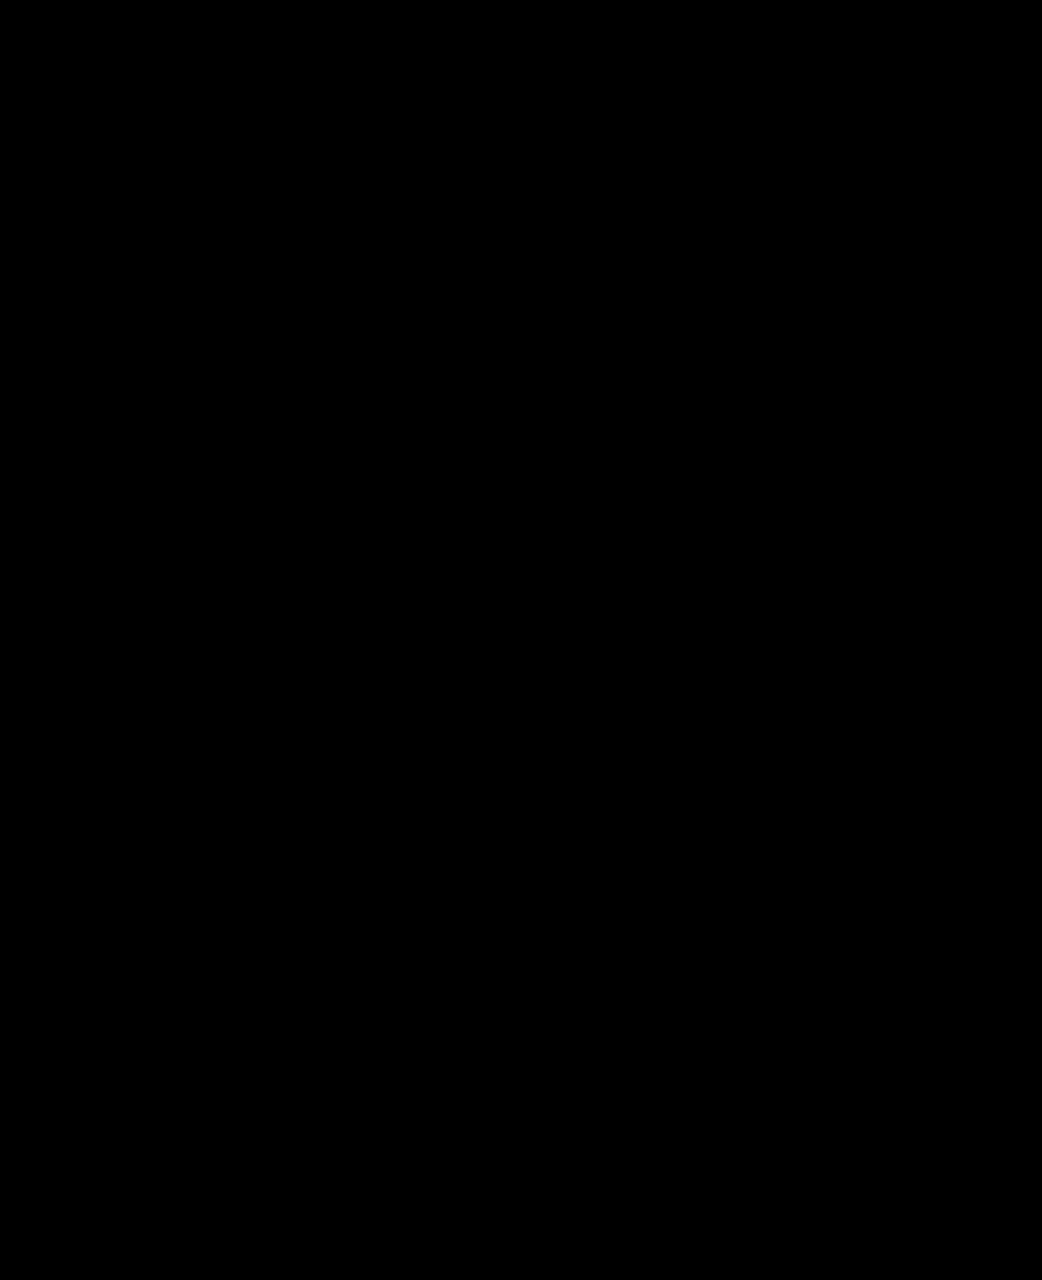 6afbe02f95a4aeb02f5fa9363f84193a